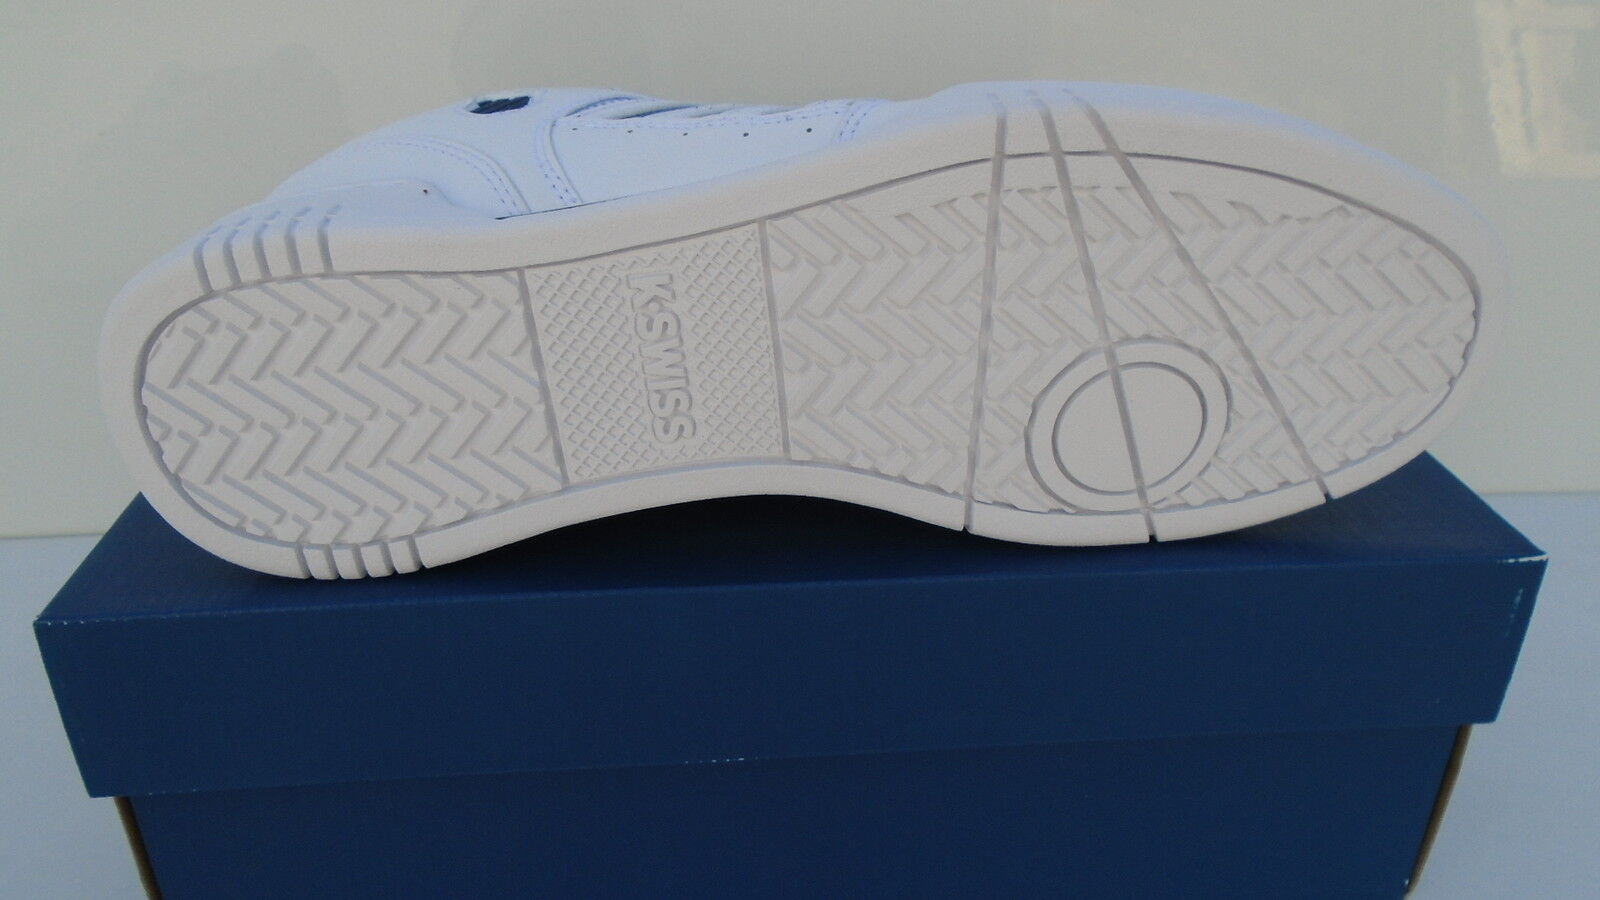 K-Swiss Chaussures Hommes Blanc Avery Médecin Cuir Avery Blanc Sneaker Chaussures De Sport Taille 39 40 NOUVEAU 595293